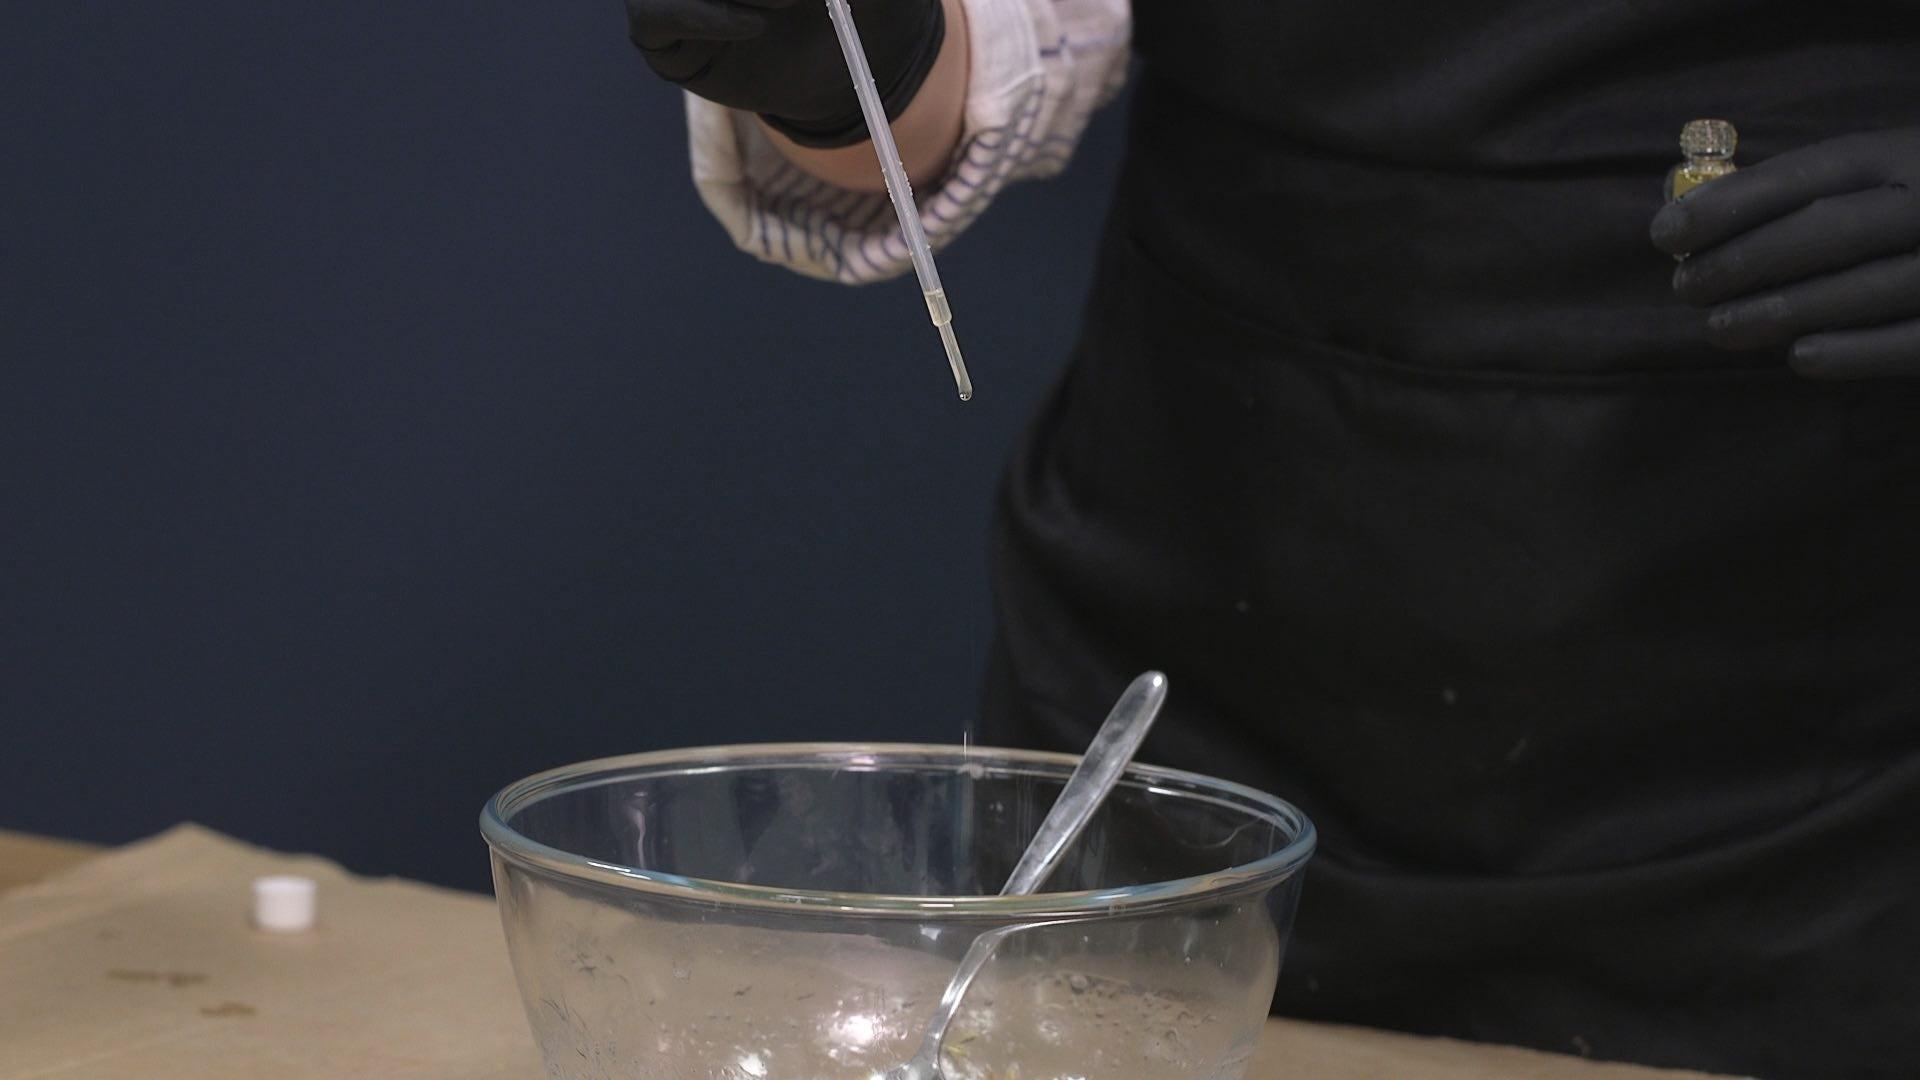 Adding fragrance